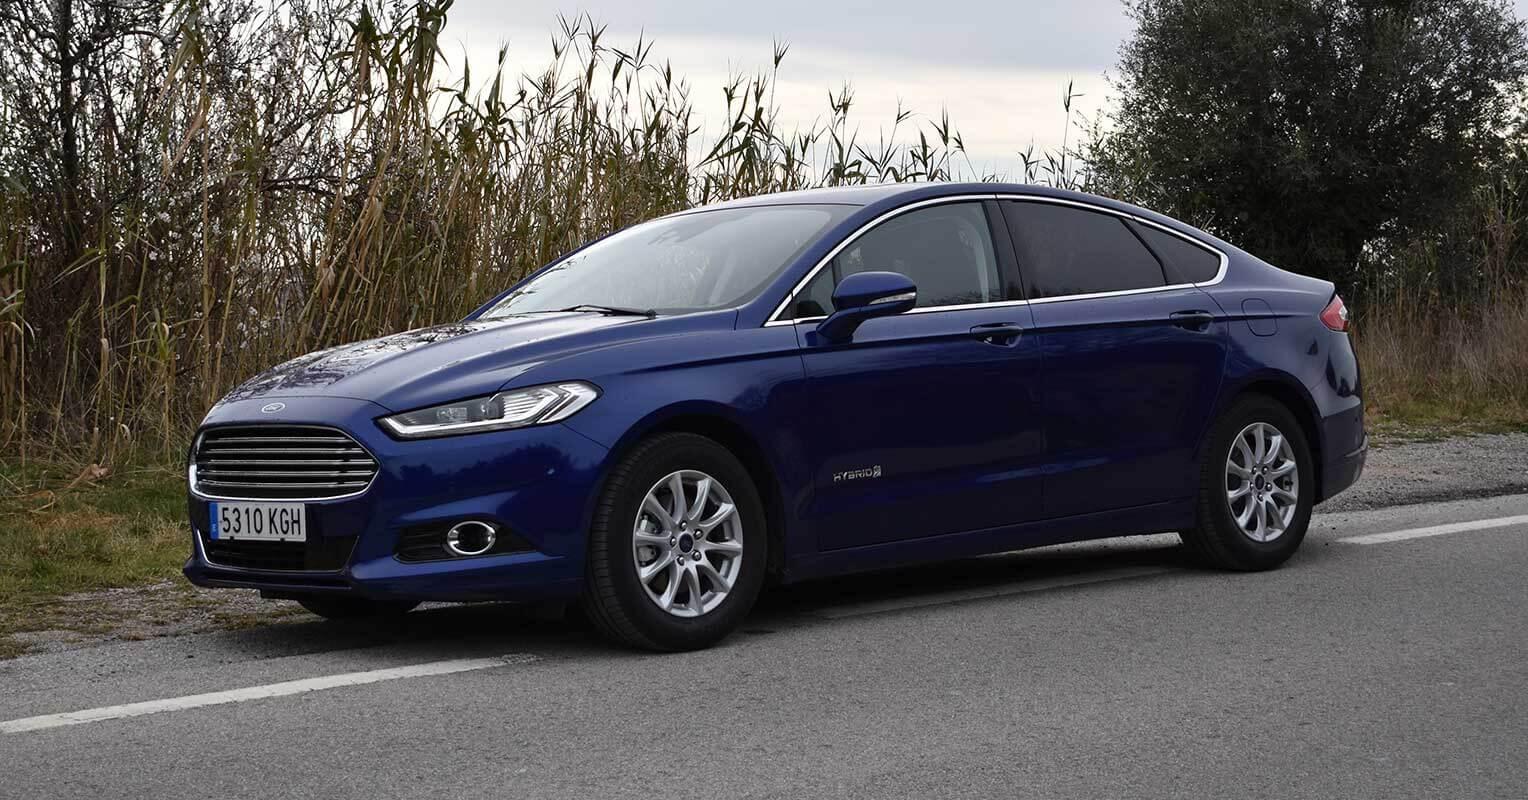 Ford Mondeo híbrido 2018